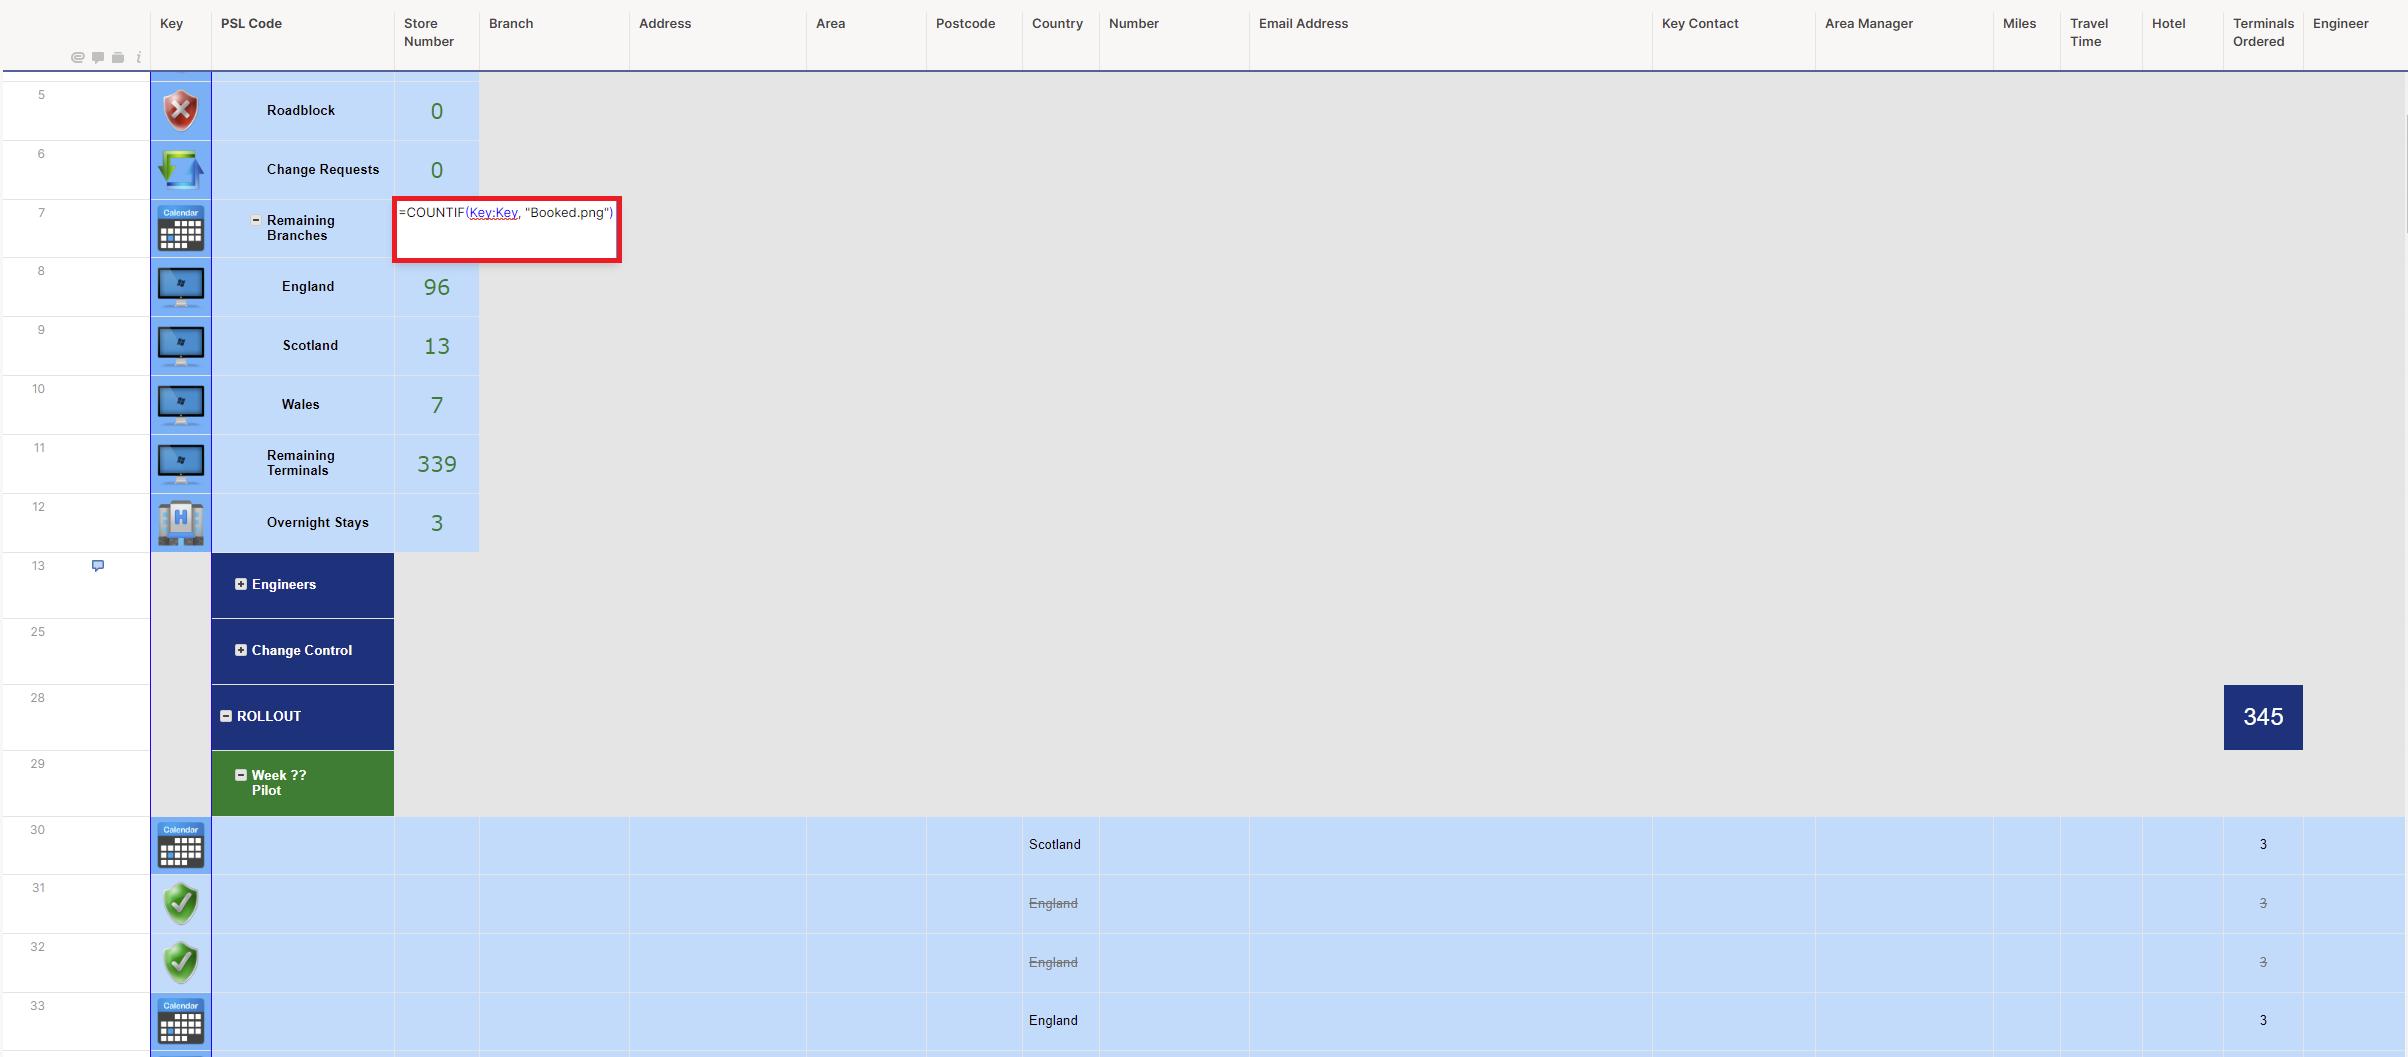 Screenshot 2021-06-09 21.24.42.png